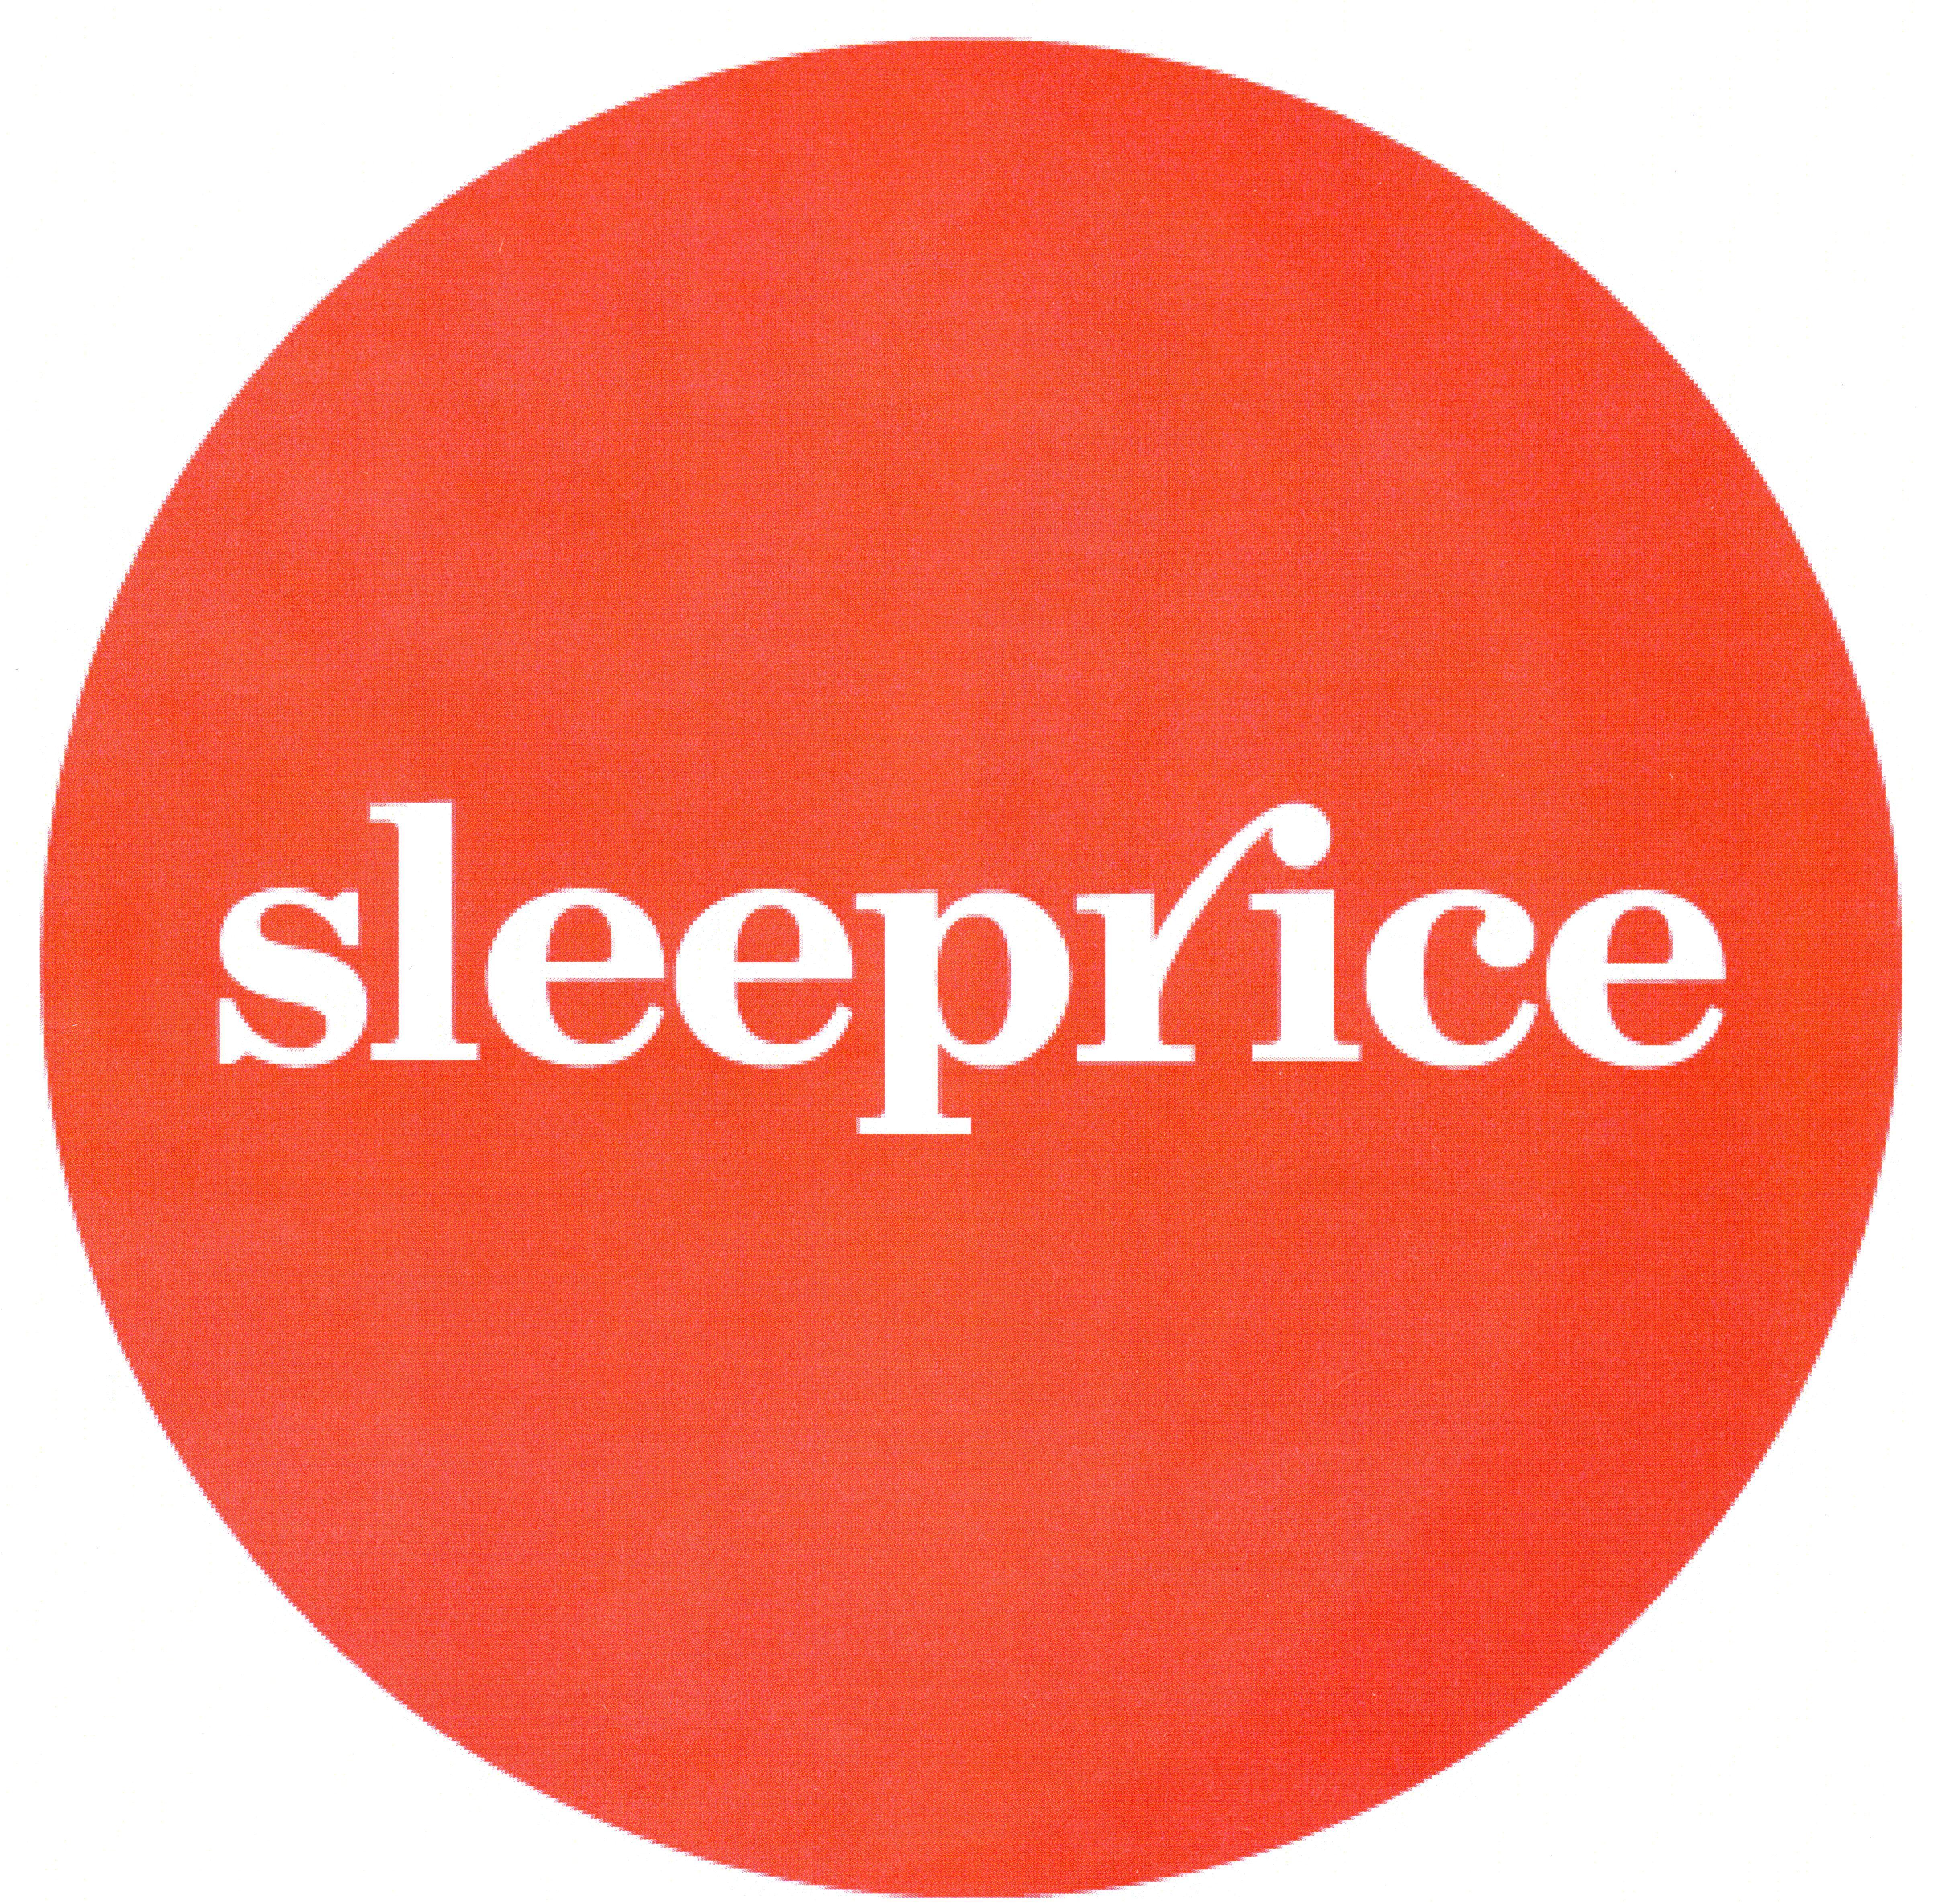 Sleeprice